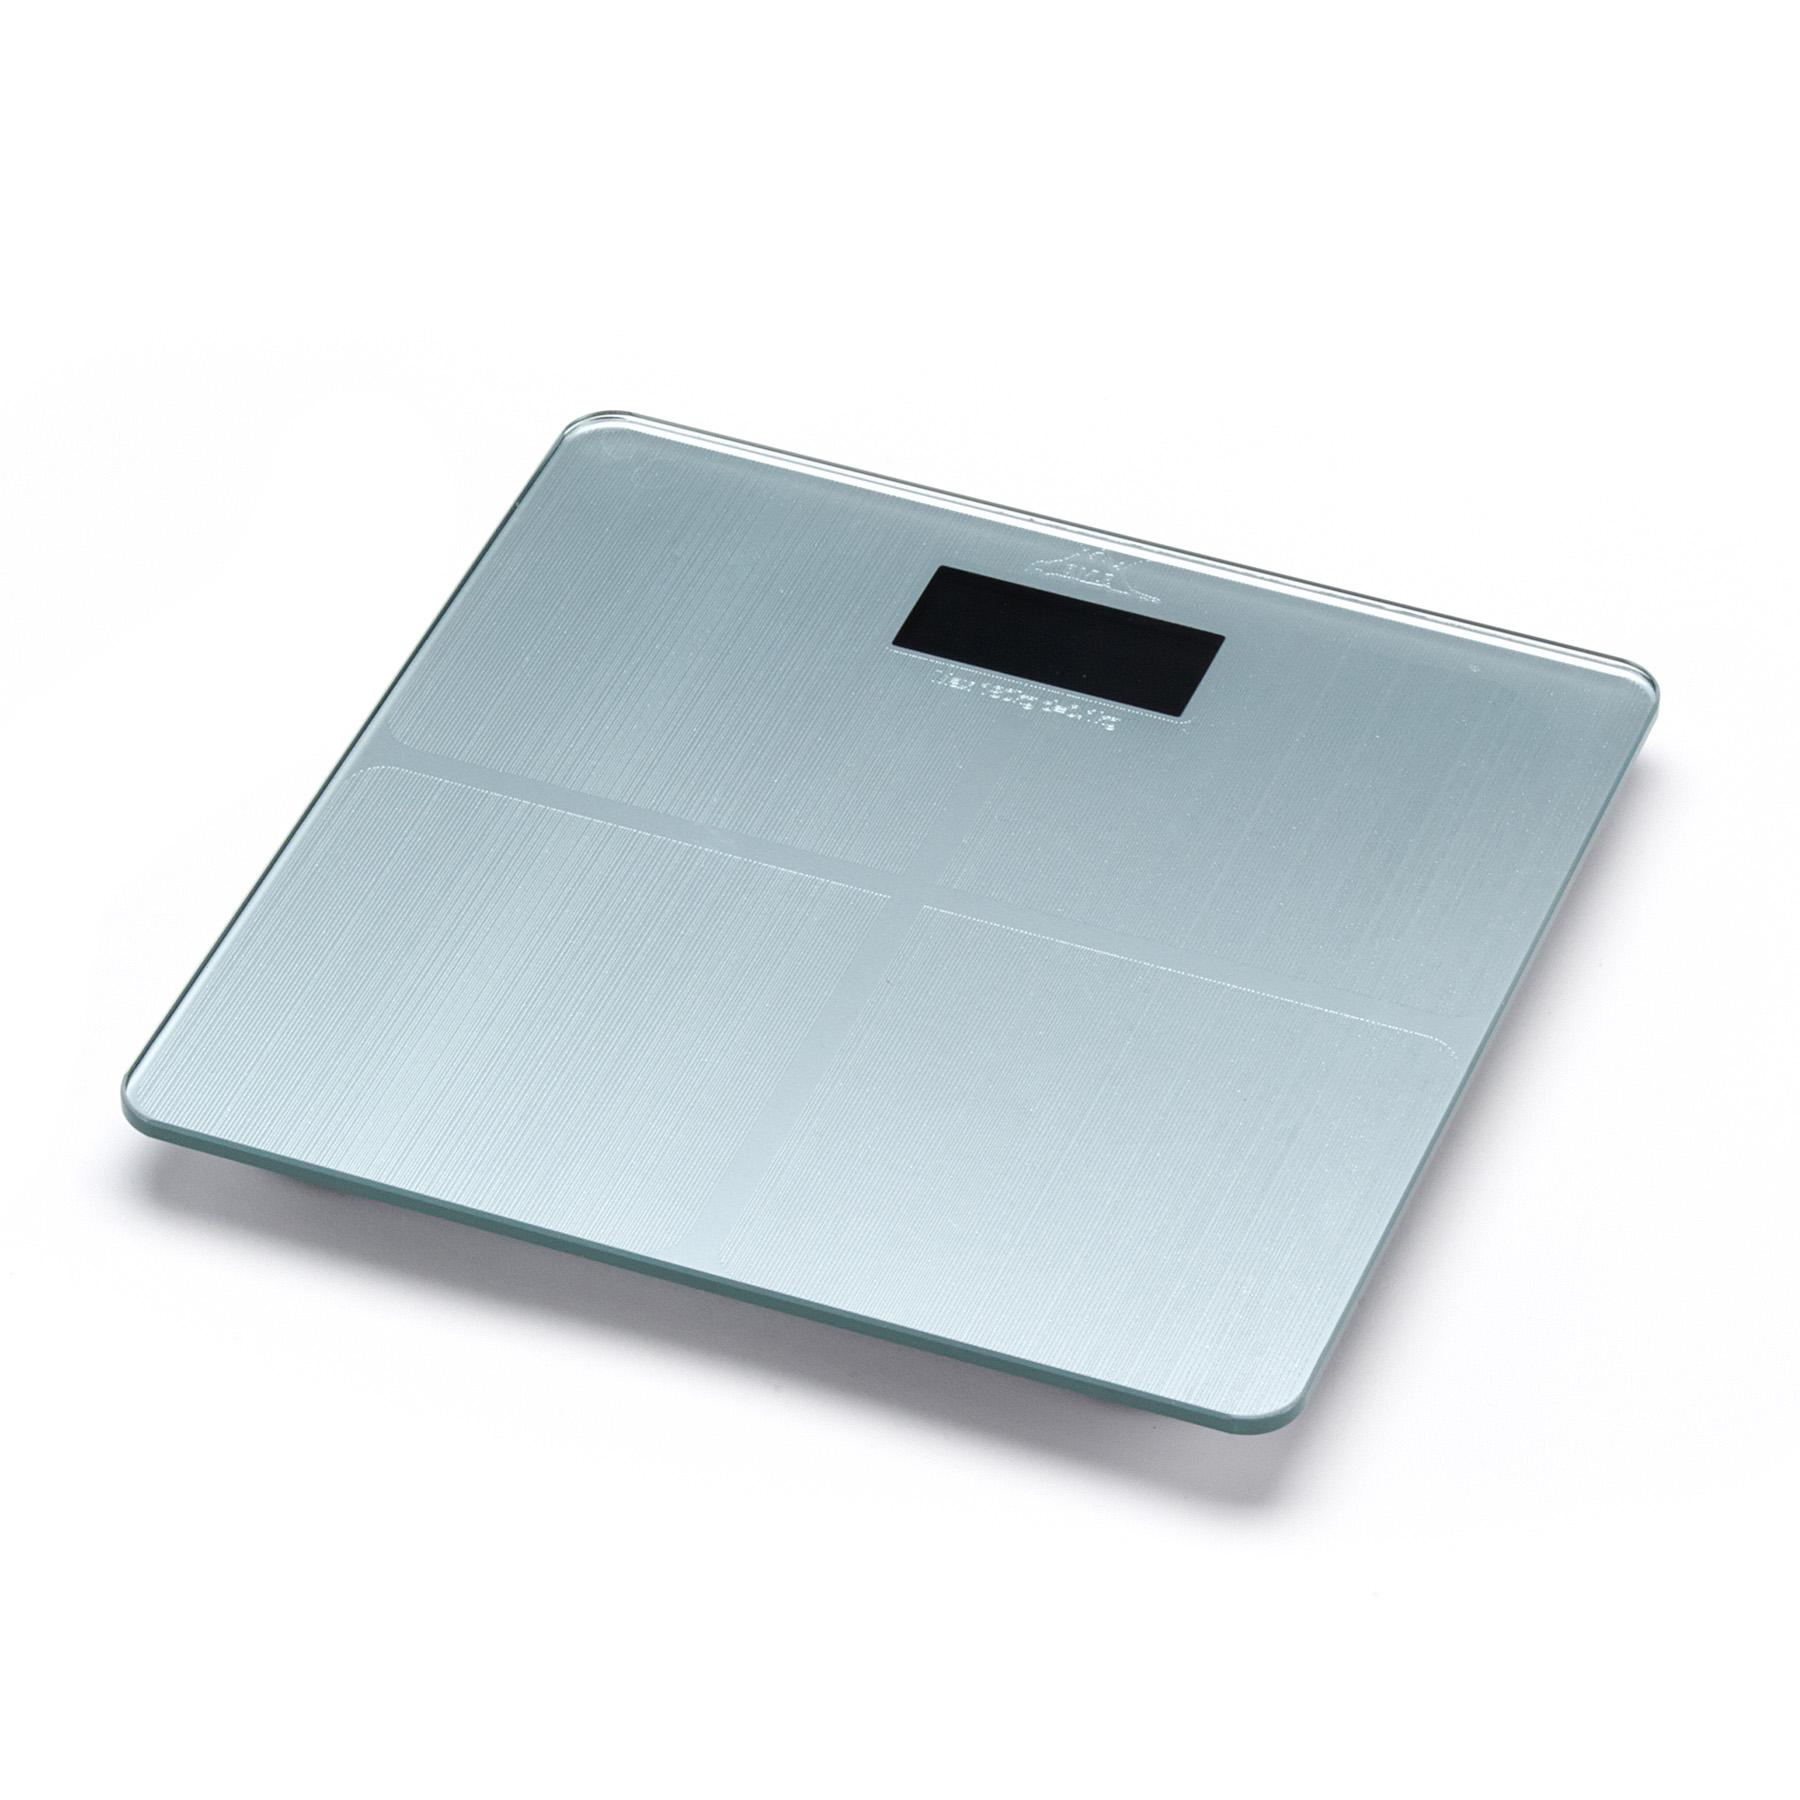 Digital Bathroom Scales For Sale: Digital Bathroom Weight Scale